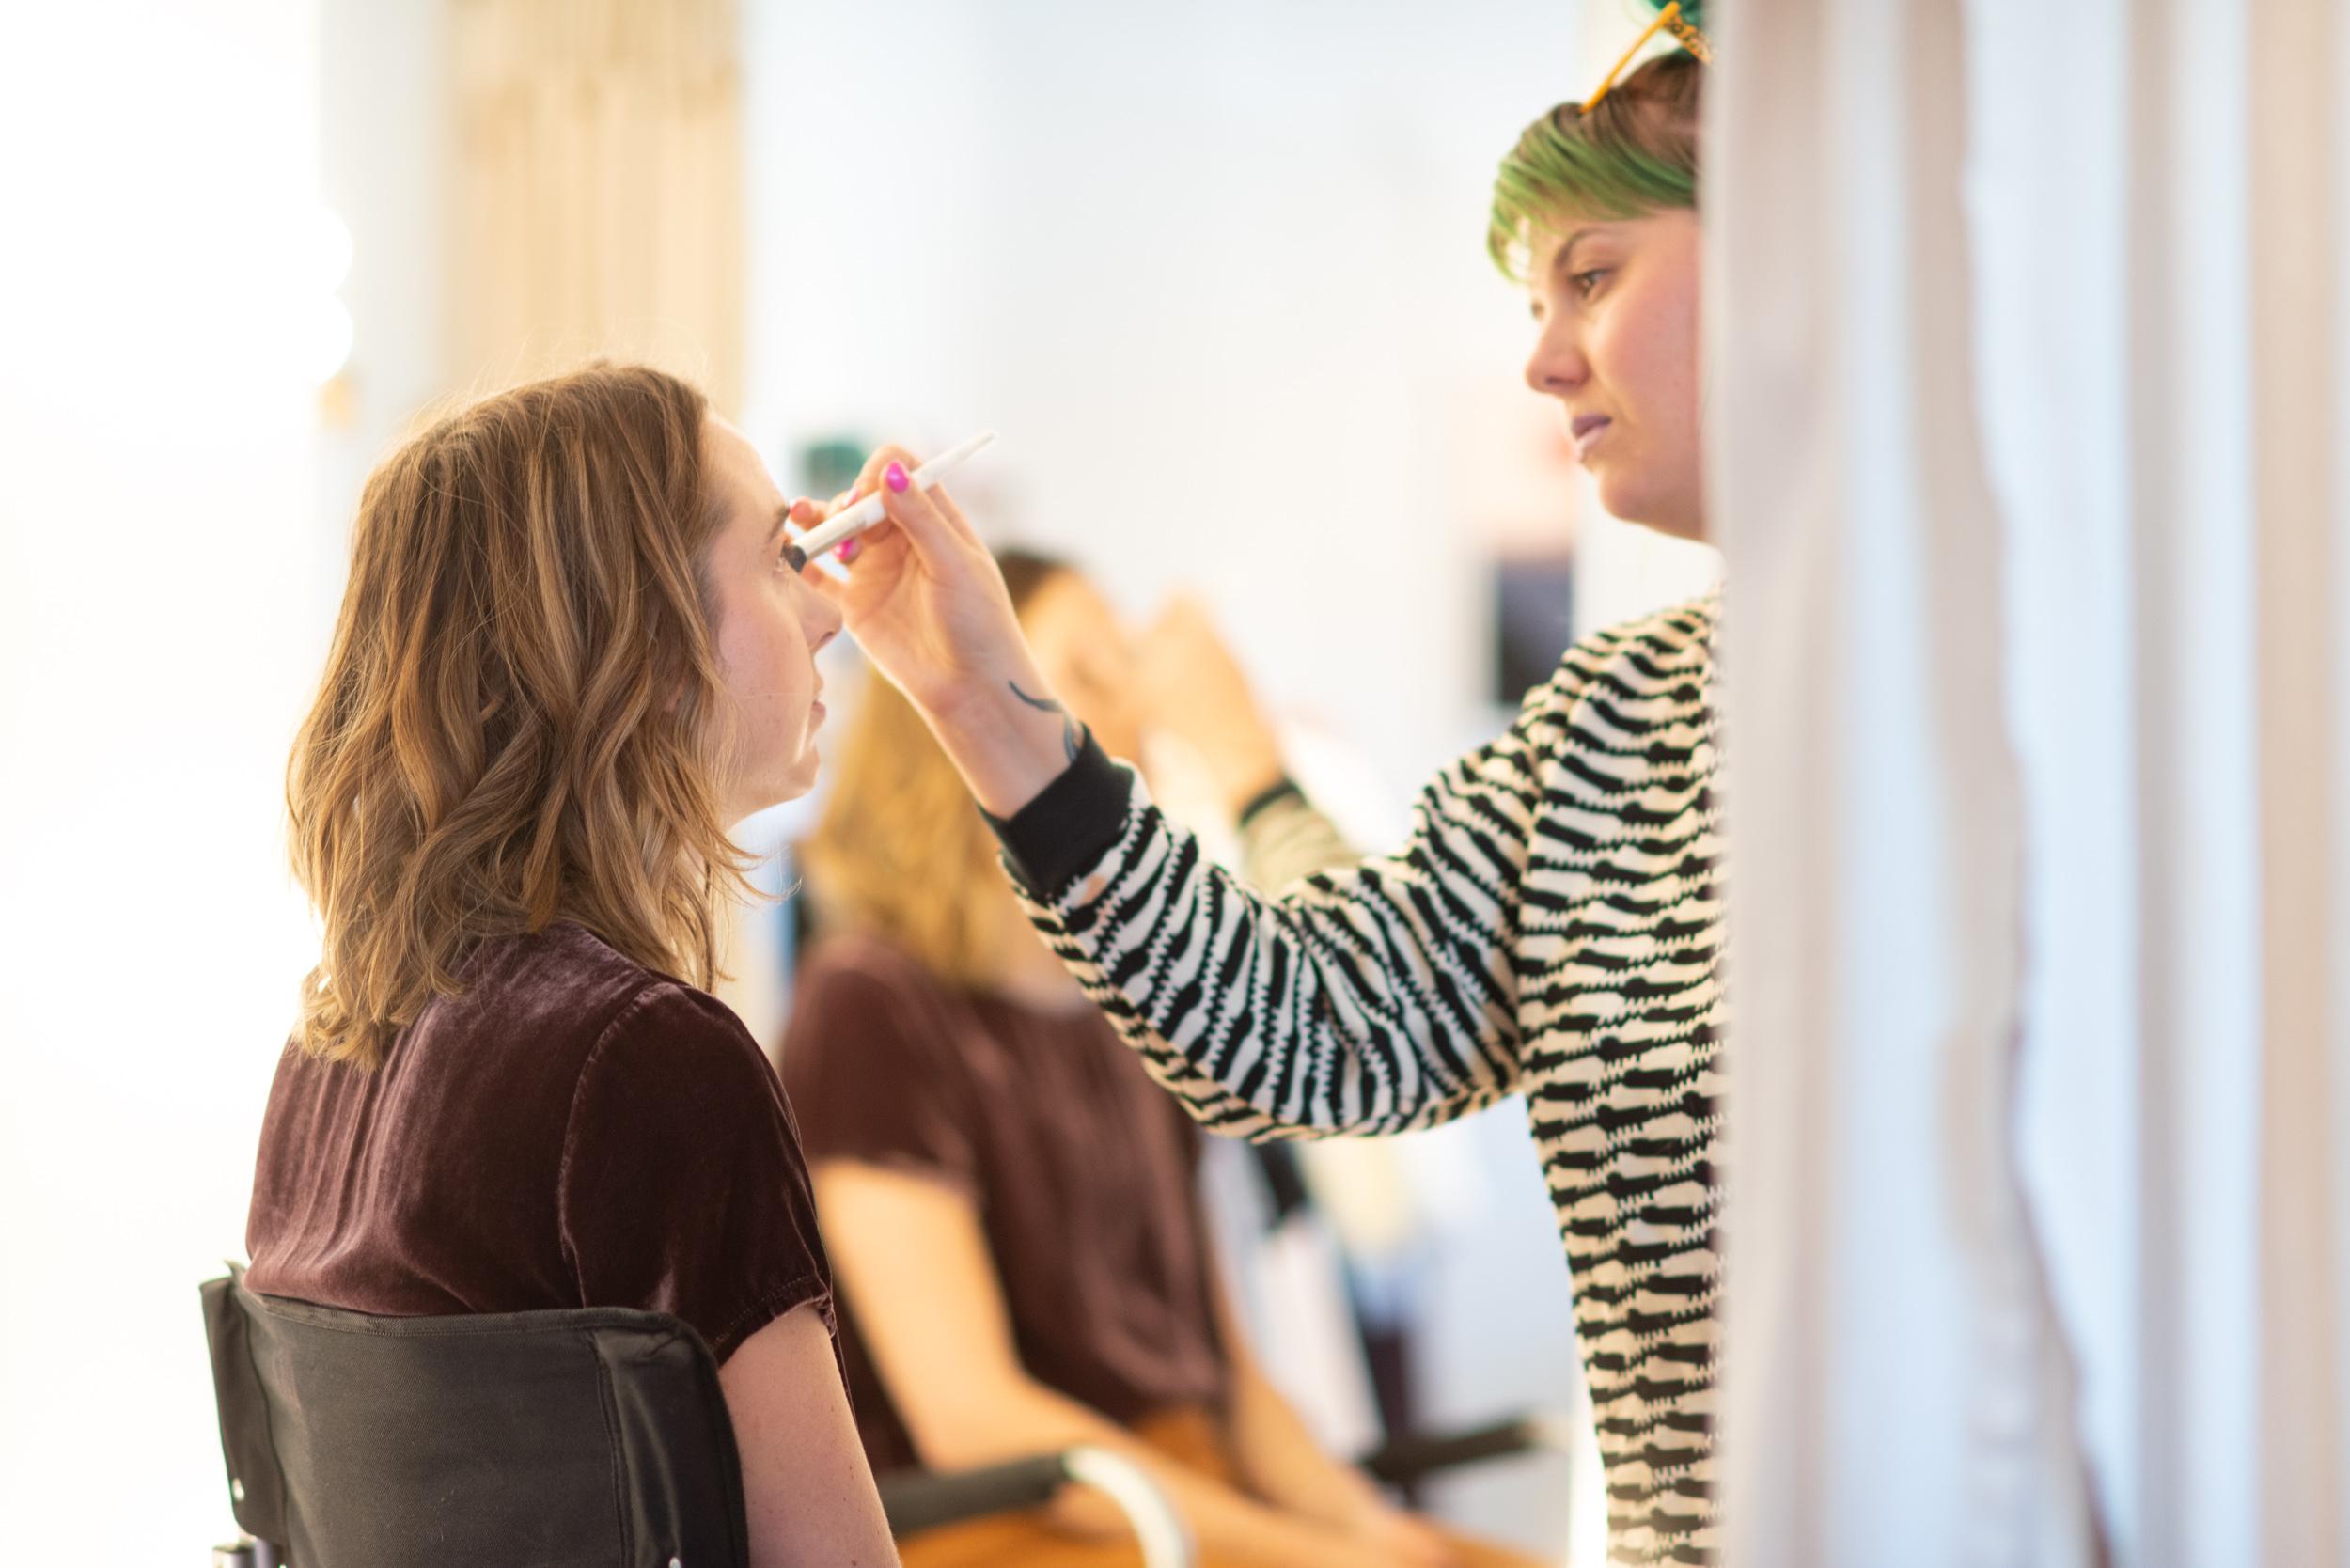 Makeup artist Noel Dalton working on Daisy